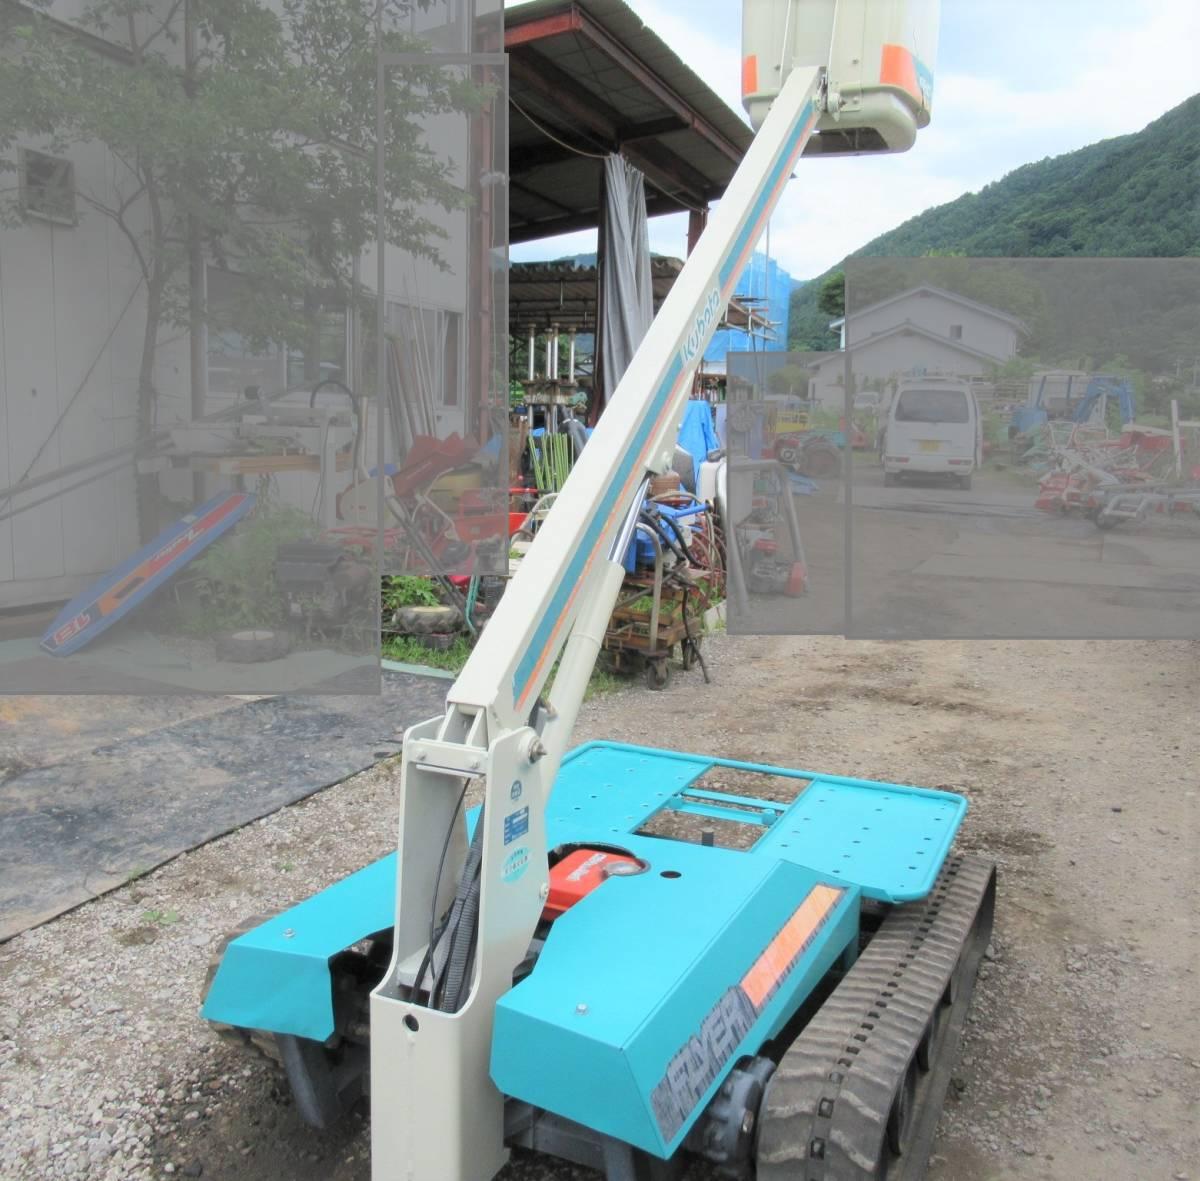 クボタ 高所作業車 FHD-6 MK‐Ⅲ 実働品 長野市_画像10